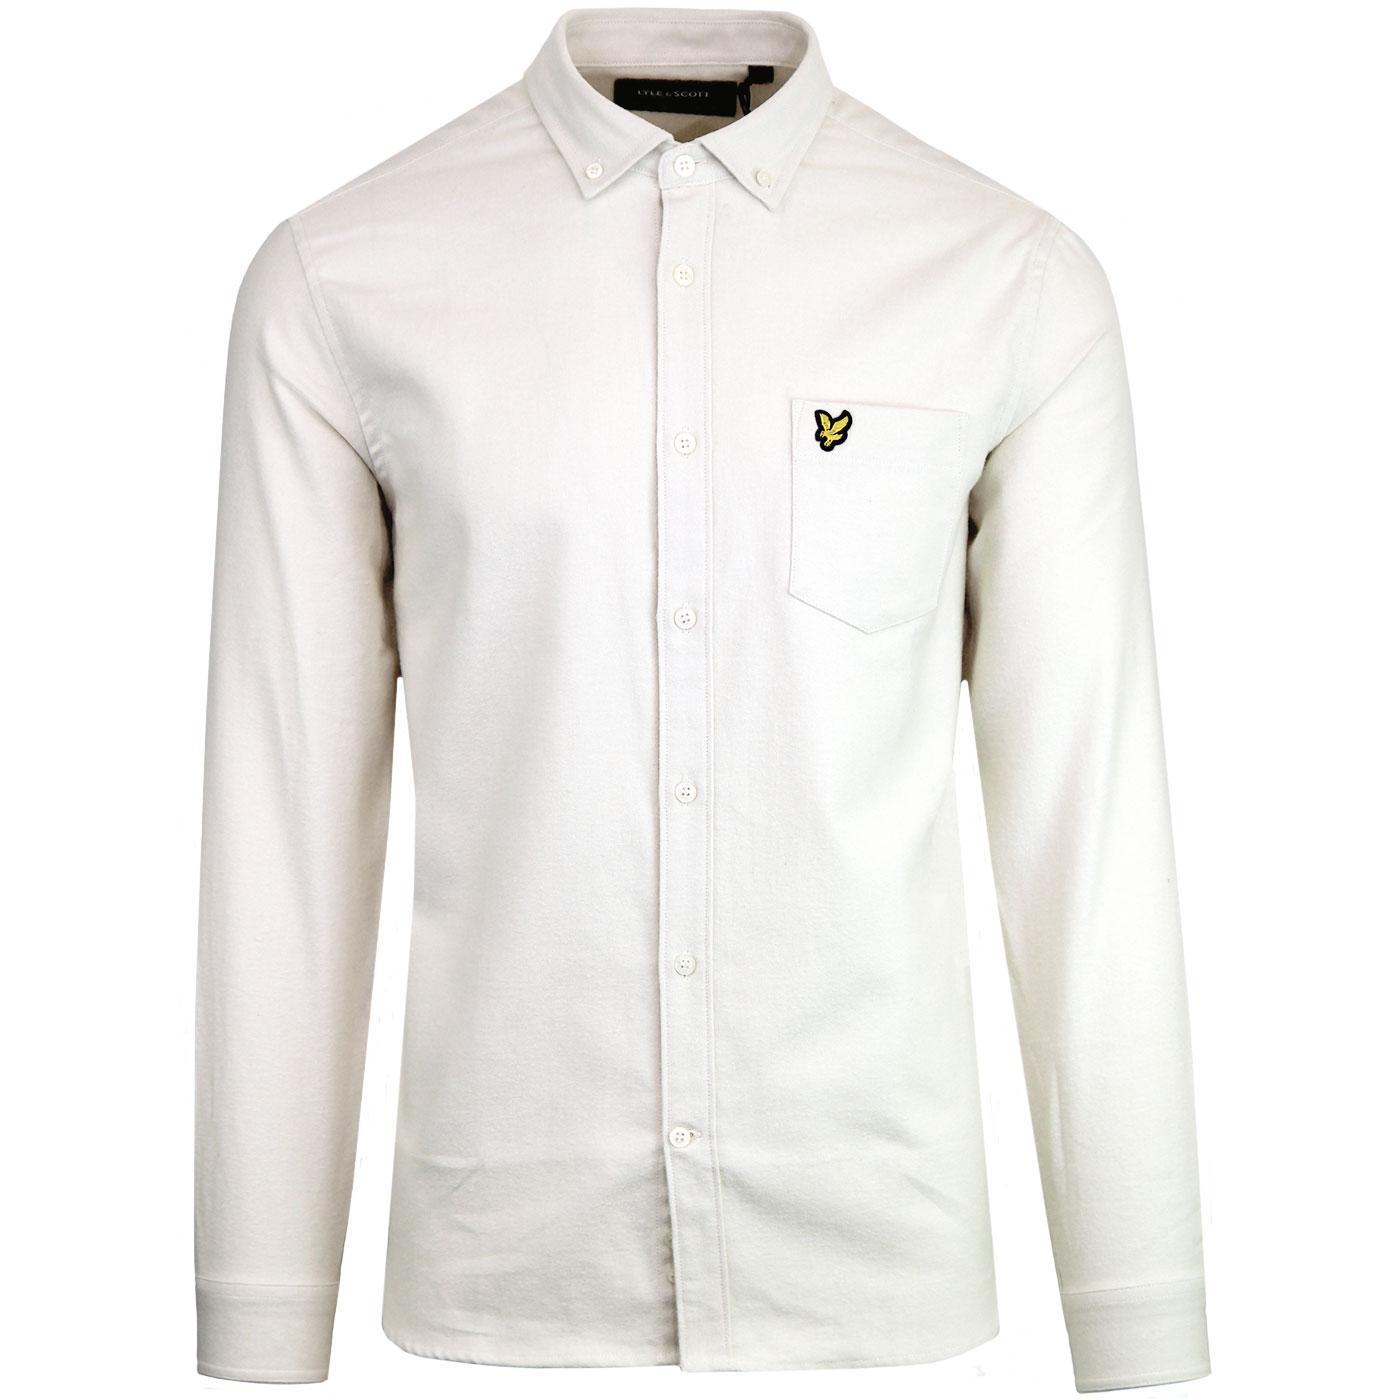 LYLE & SCOTT Winter Flannel Shirt (Seashell White)